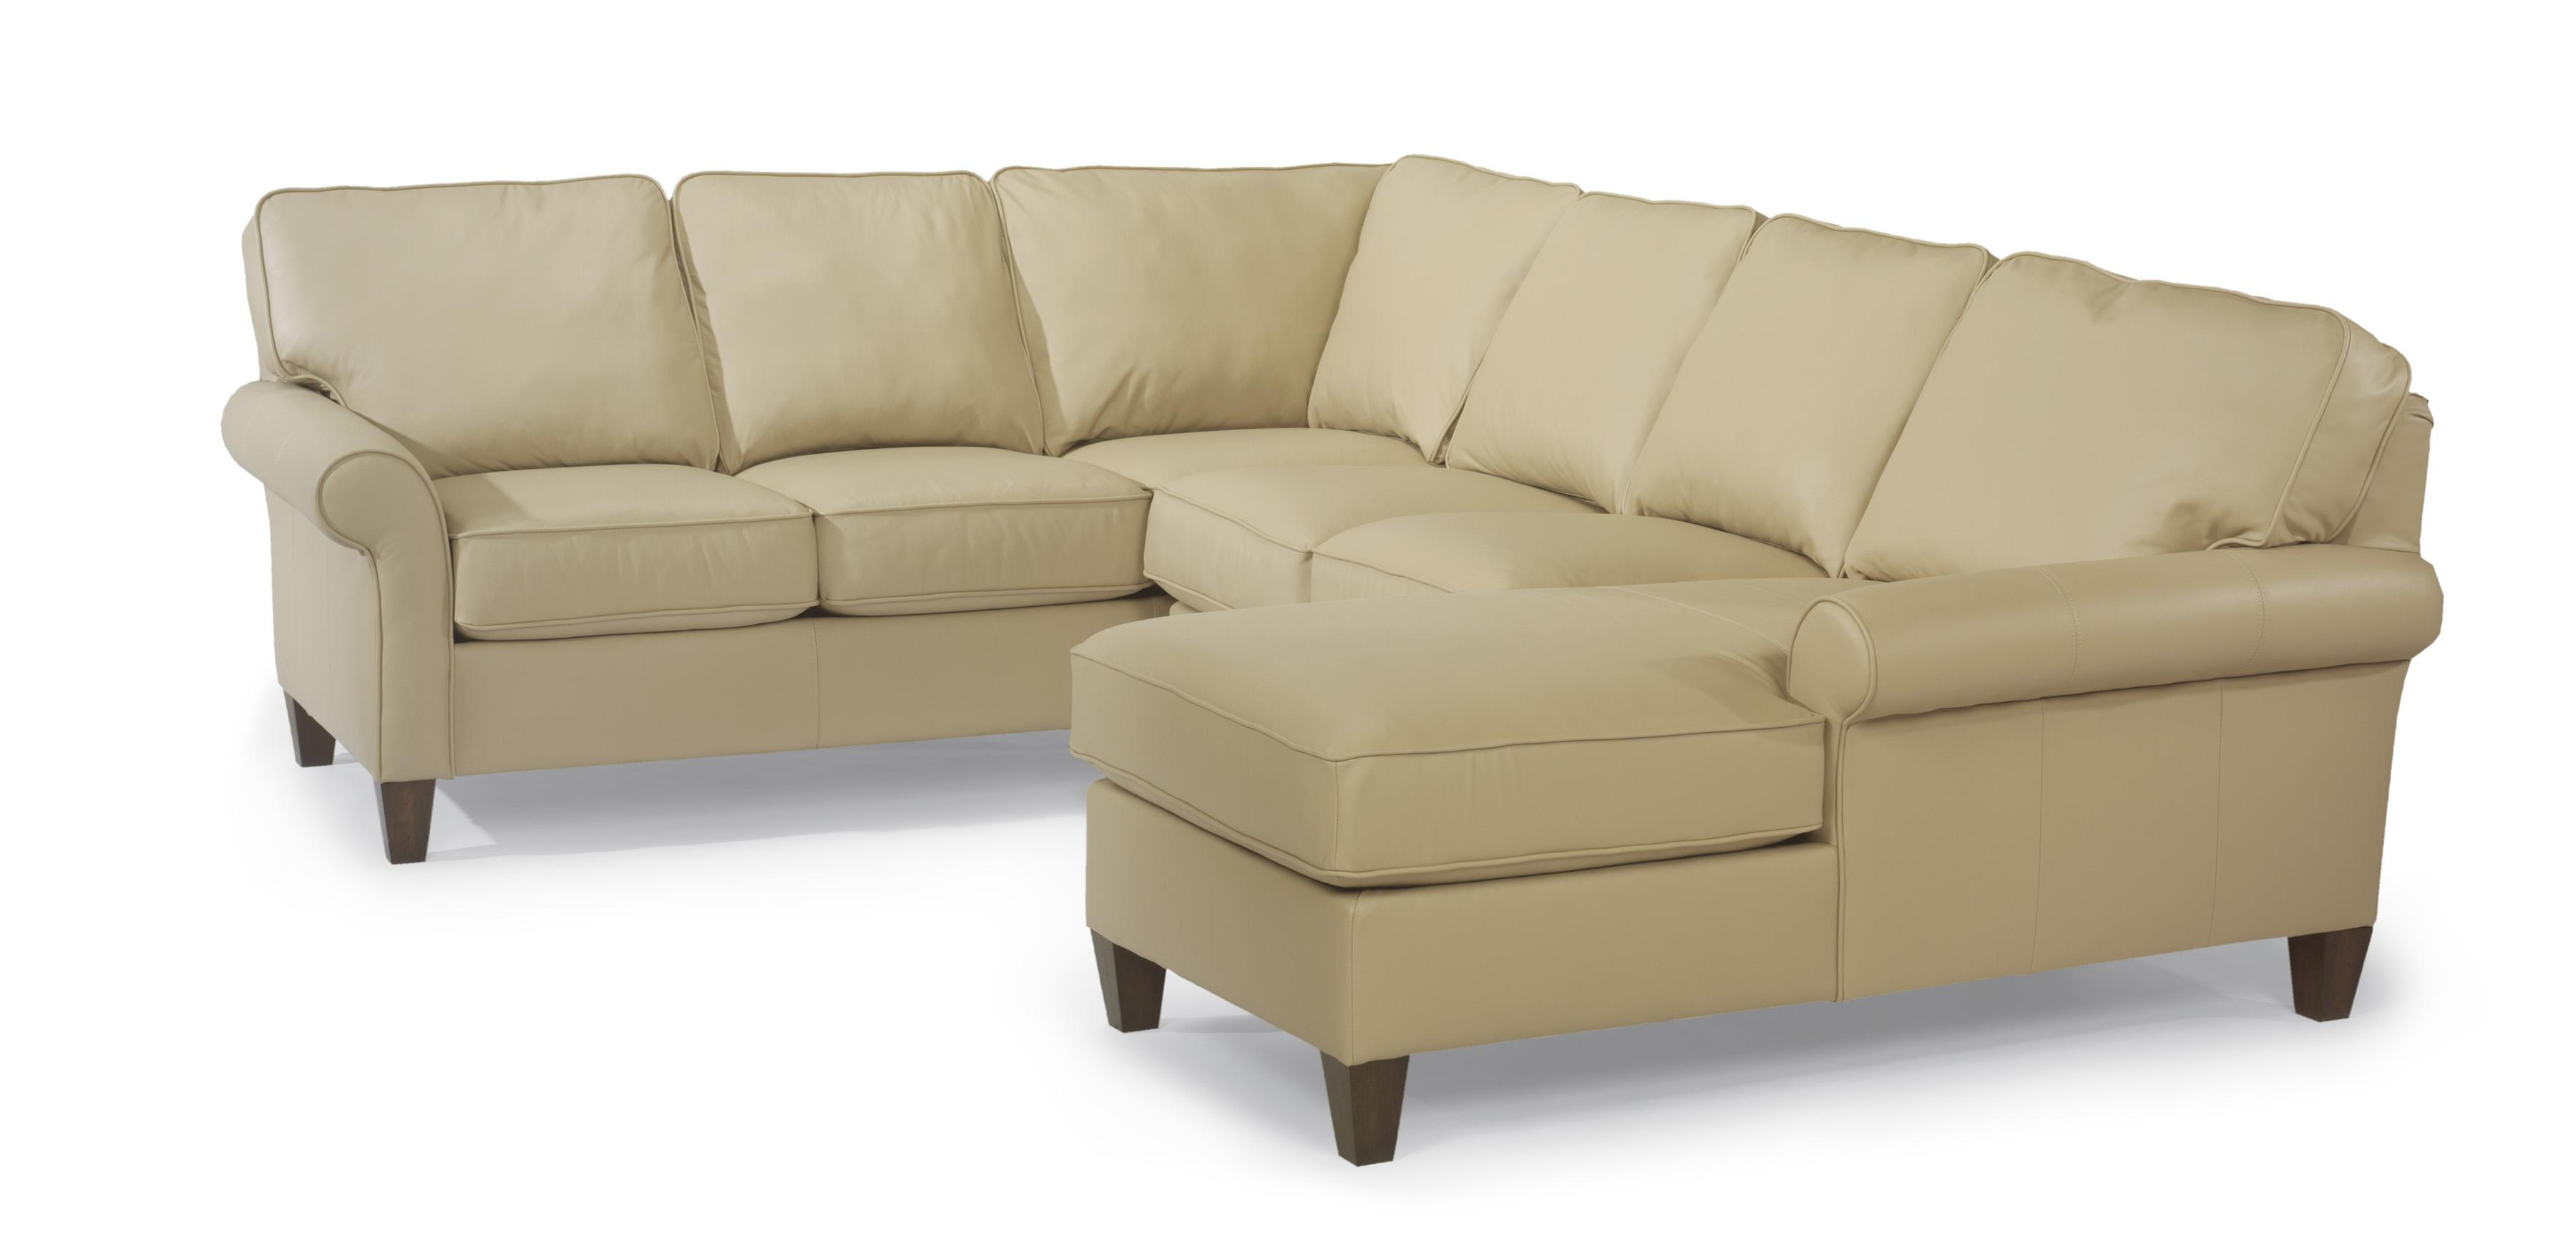 Astonishing Westside Sectional Sofa Andrewgaddart Wooden Chair Designs For Living Room Andrewgaddartcom